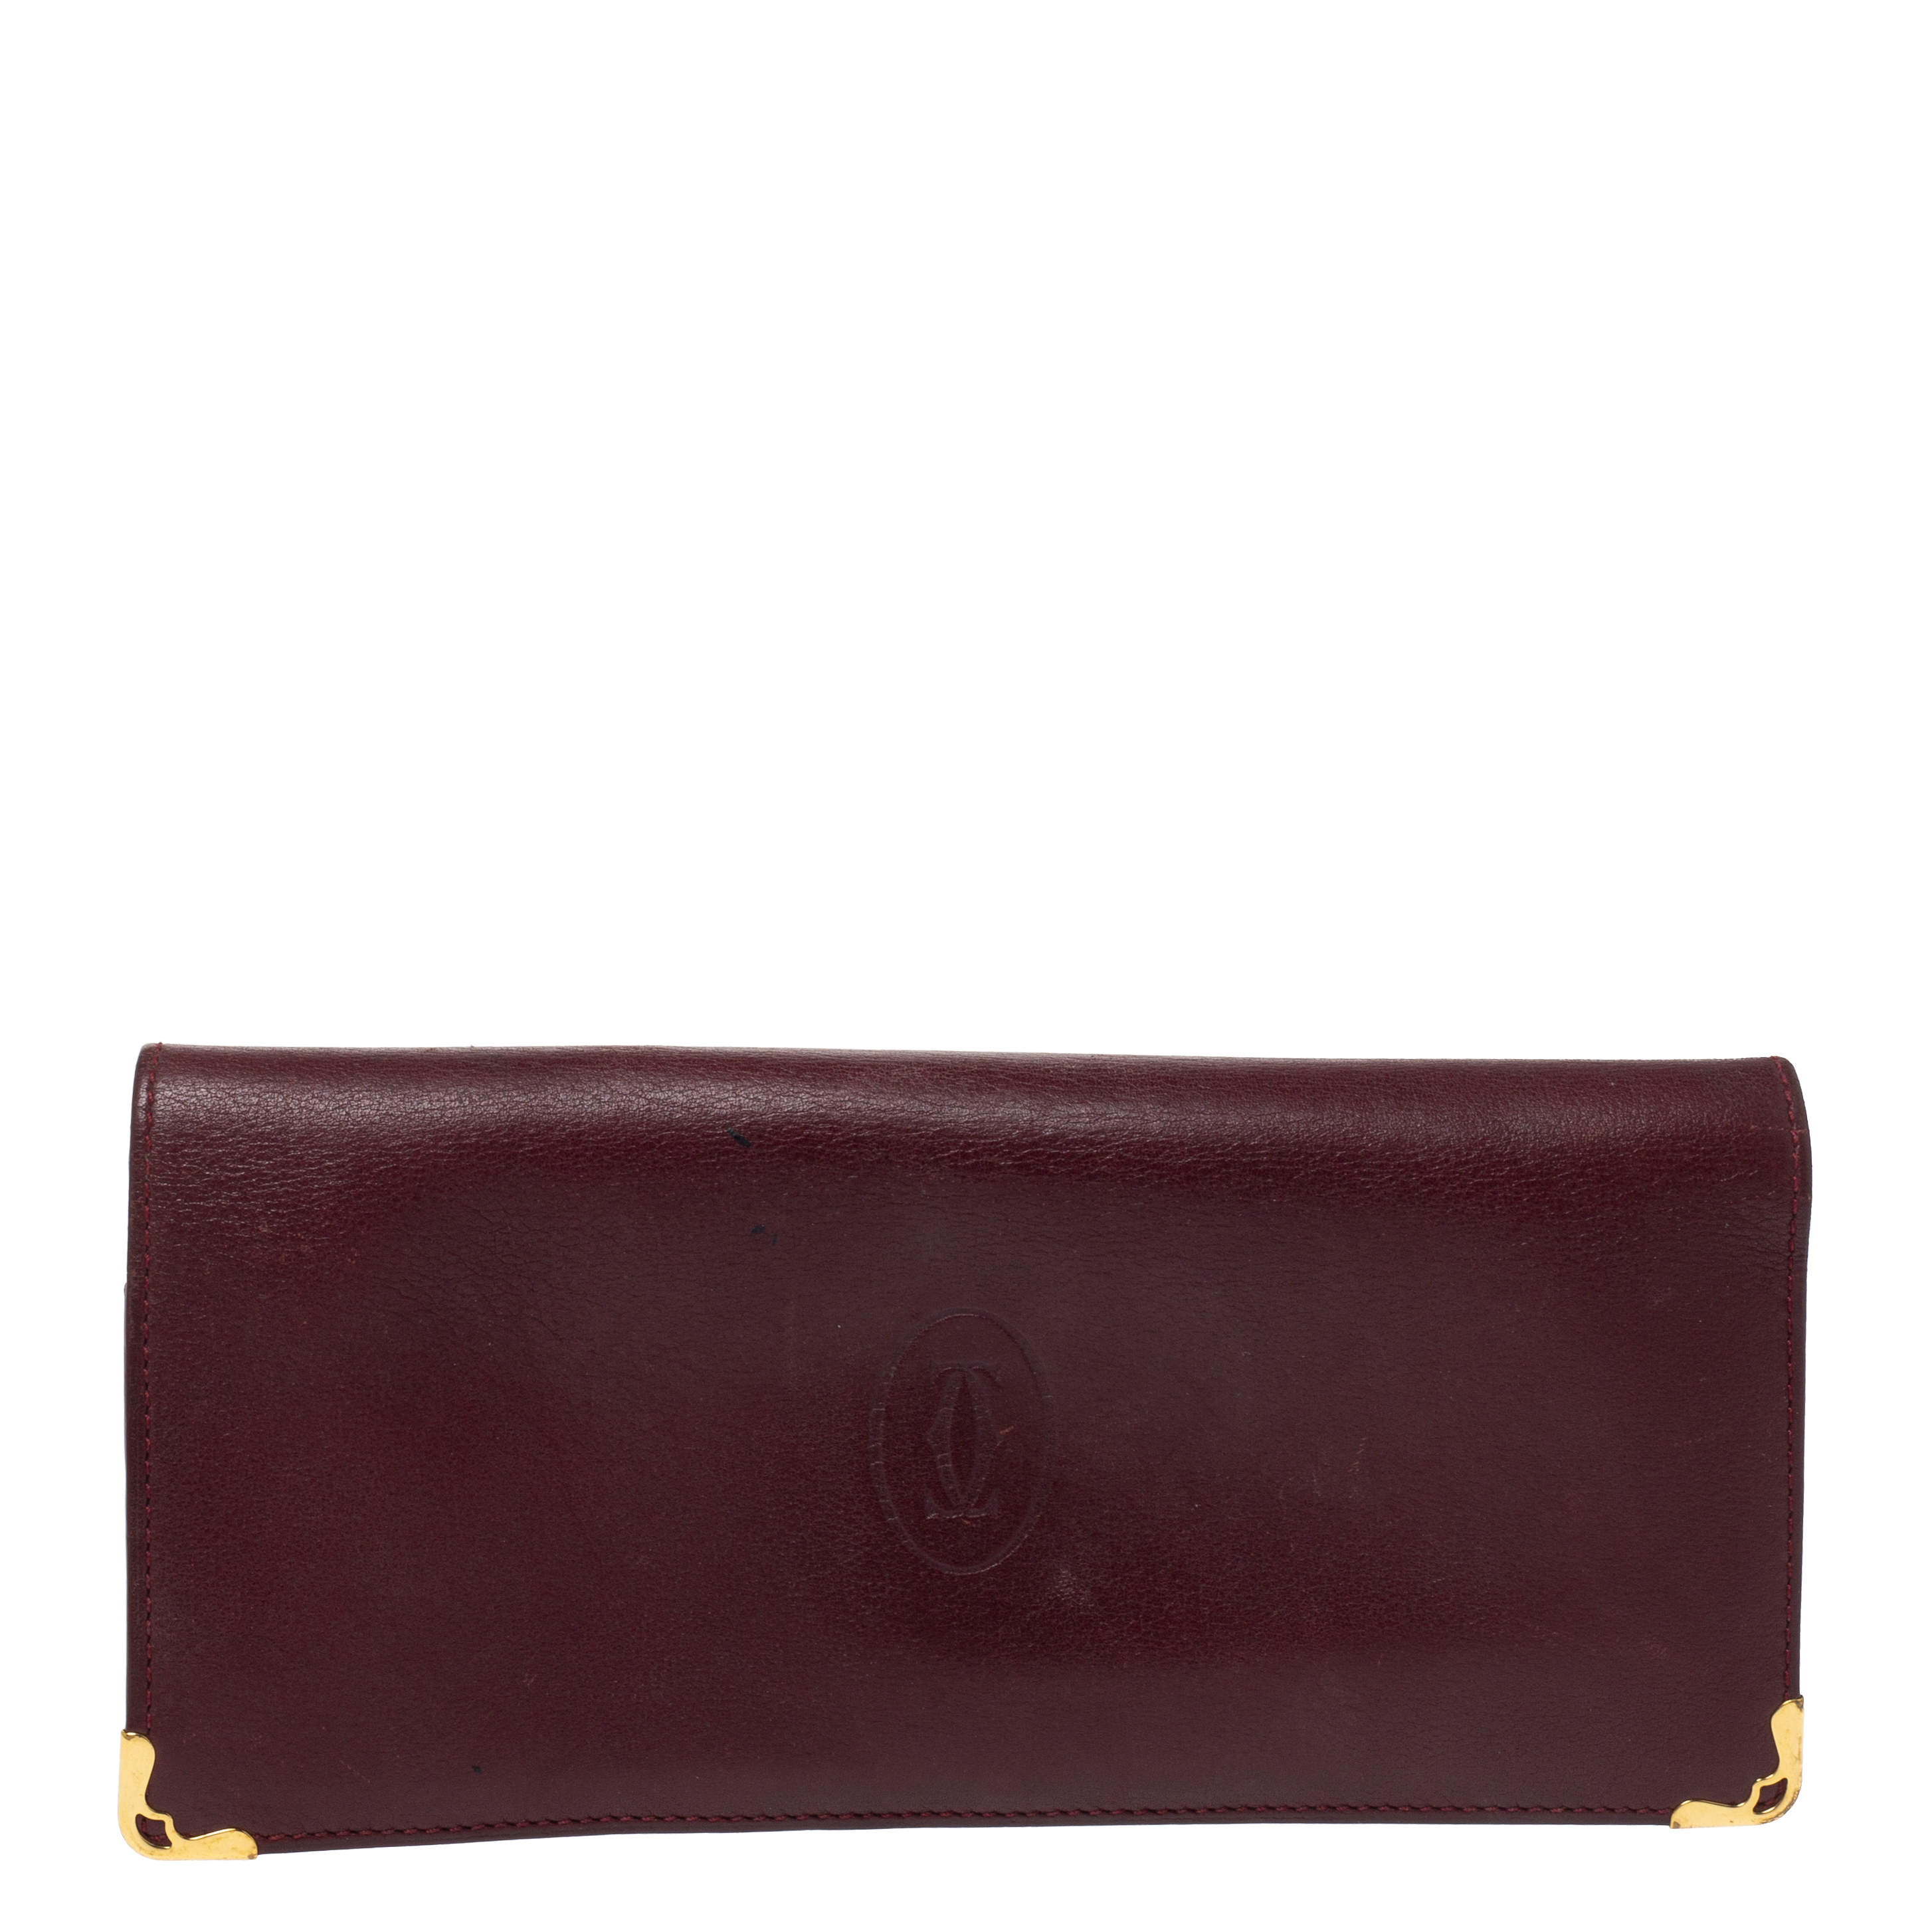 Cartier Maroon Leather Must De Cartier Wallet